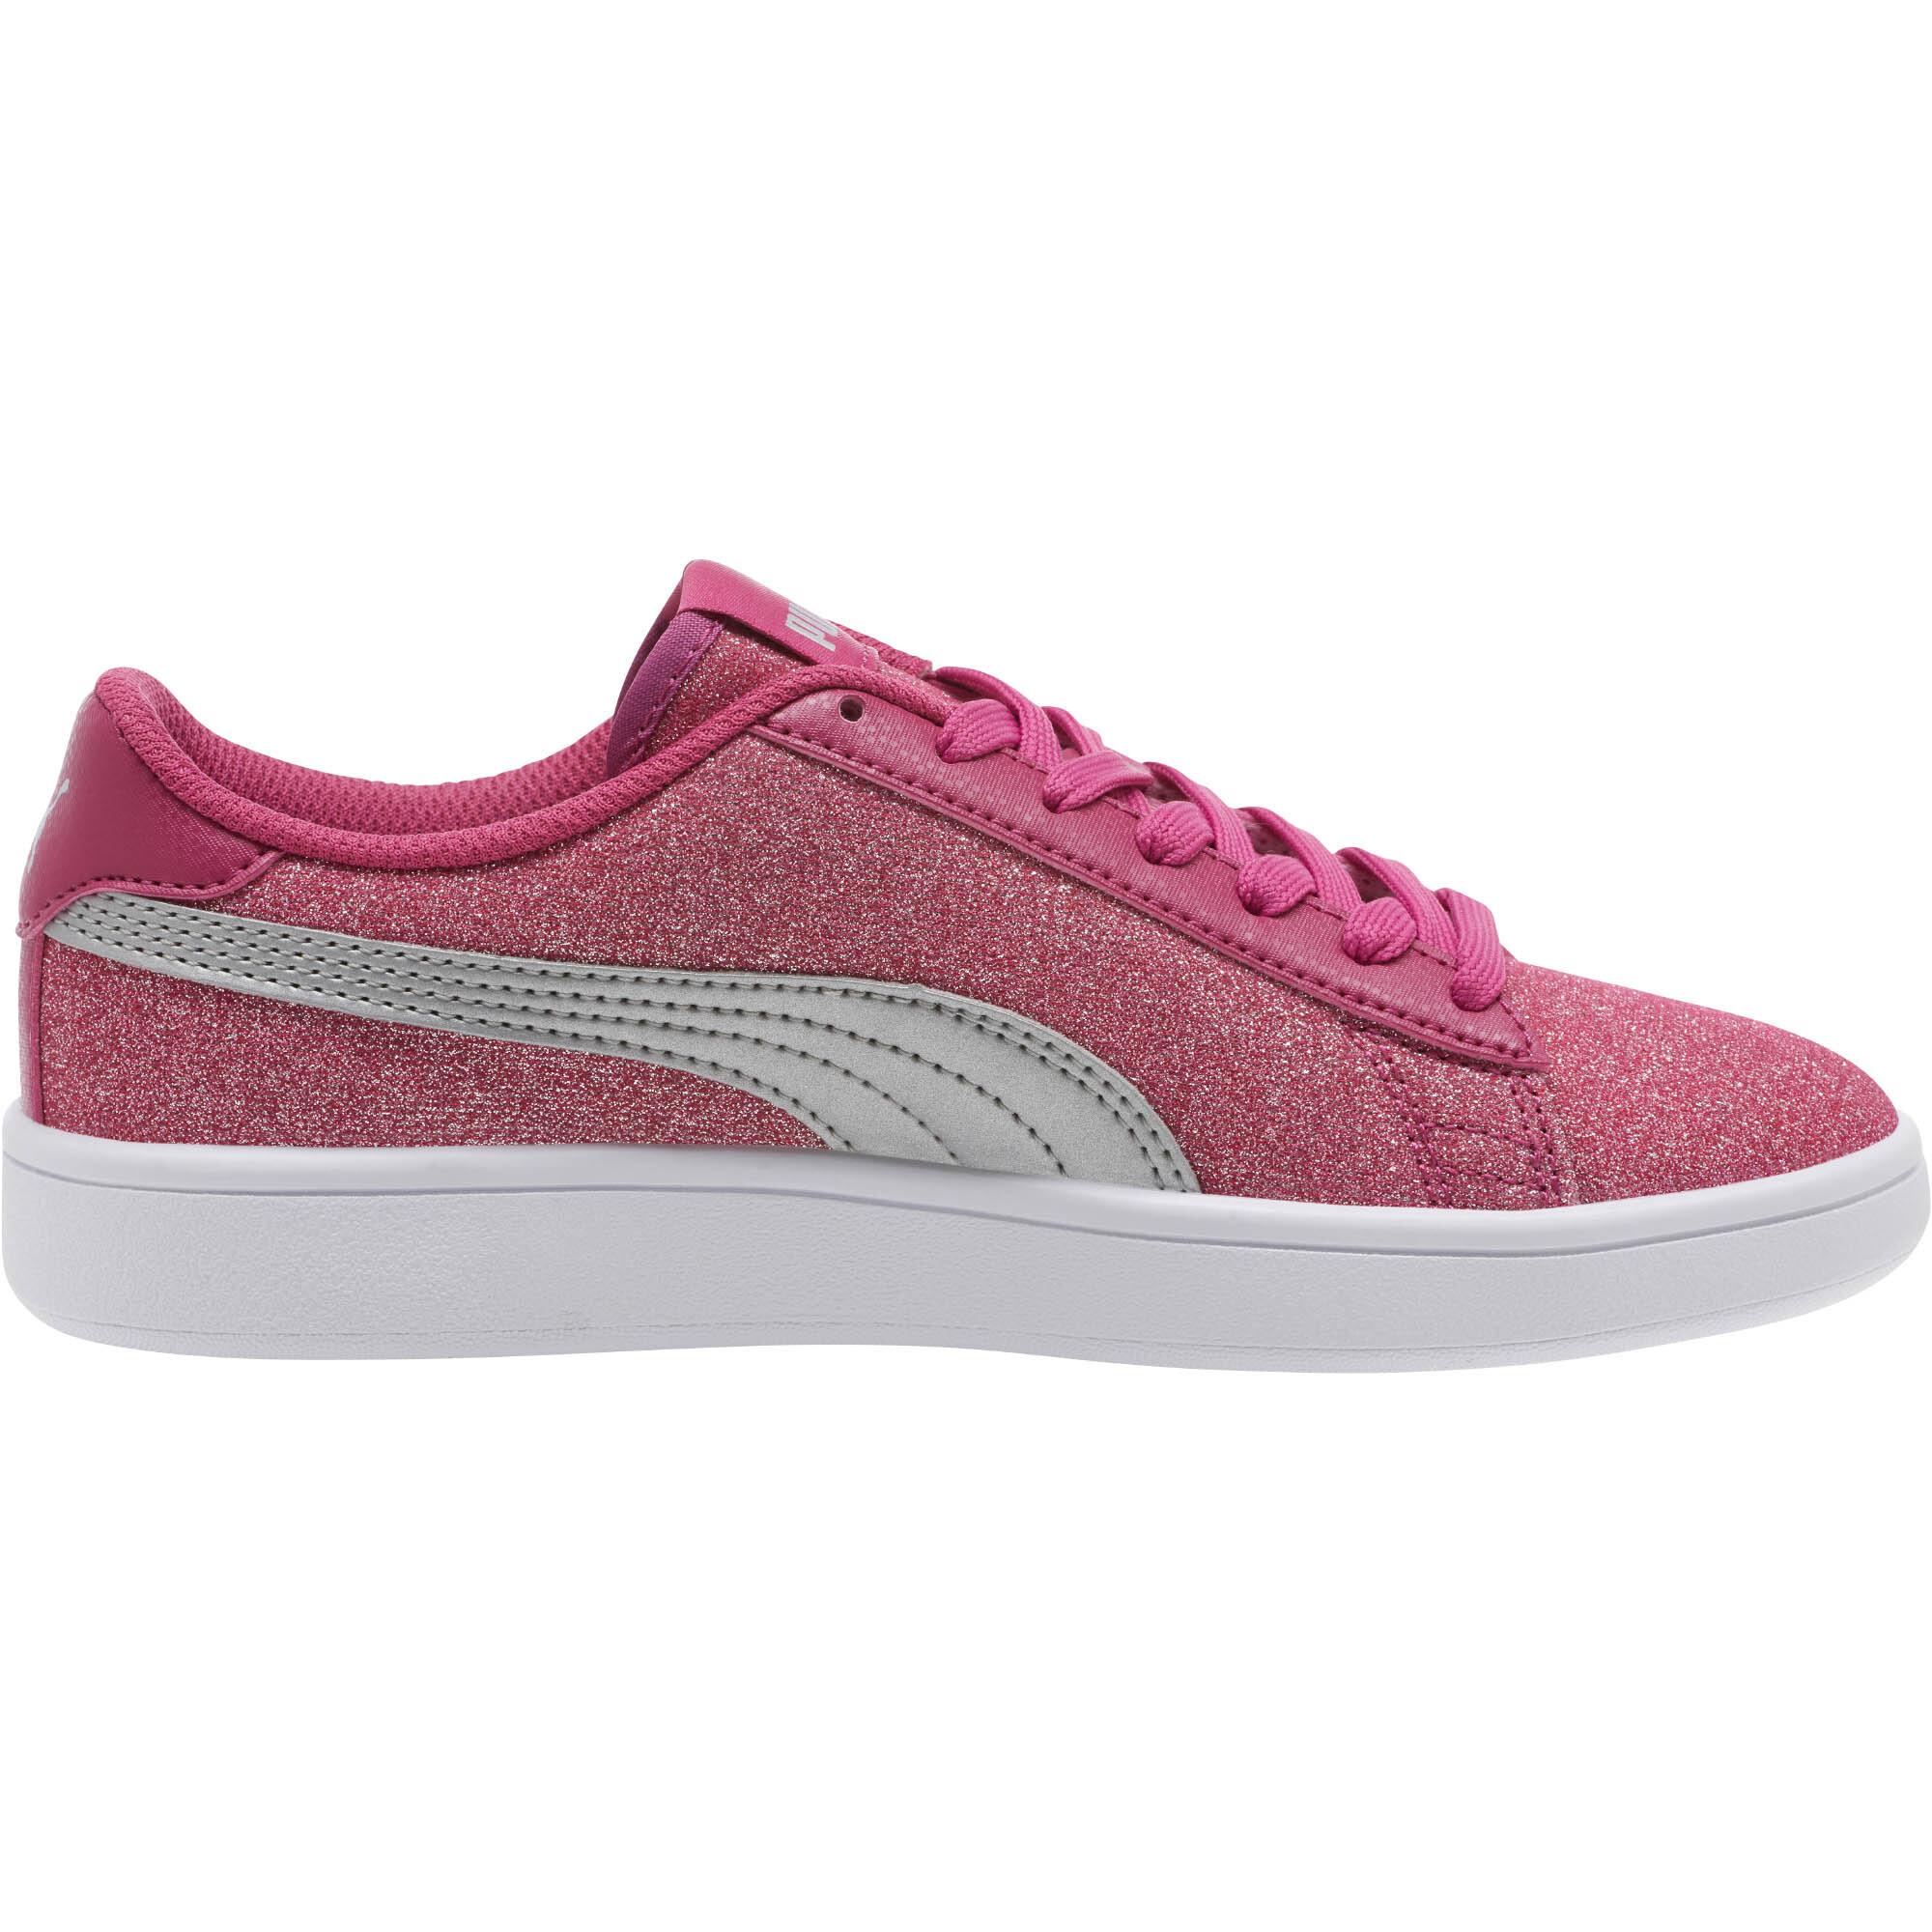 PUMA-Smash-v2-Glitz-Glam-Sneakers-JR-Girls-Shoe-Kids thumbnail 10